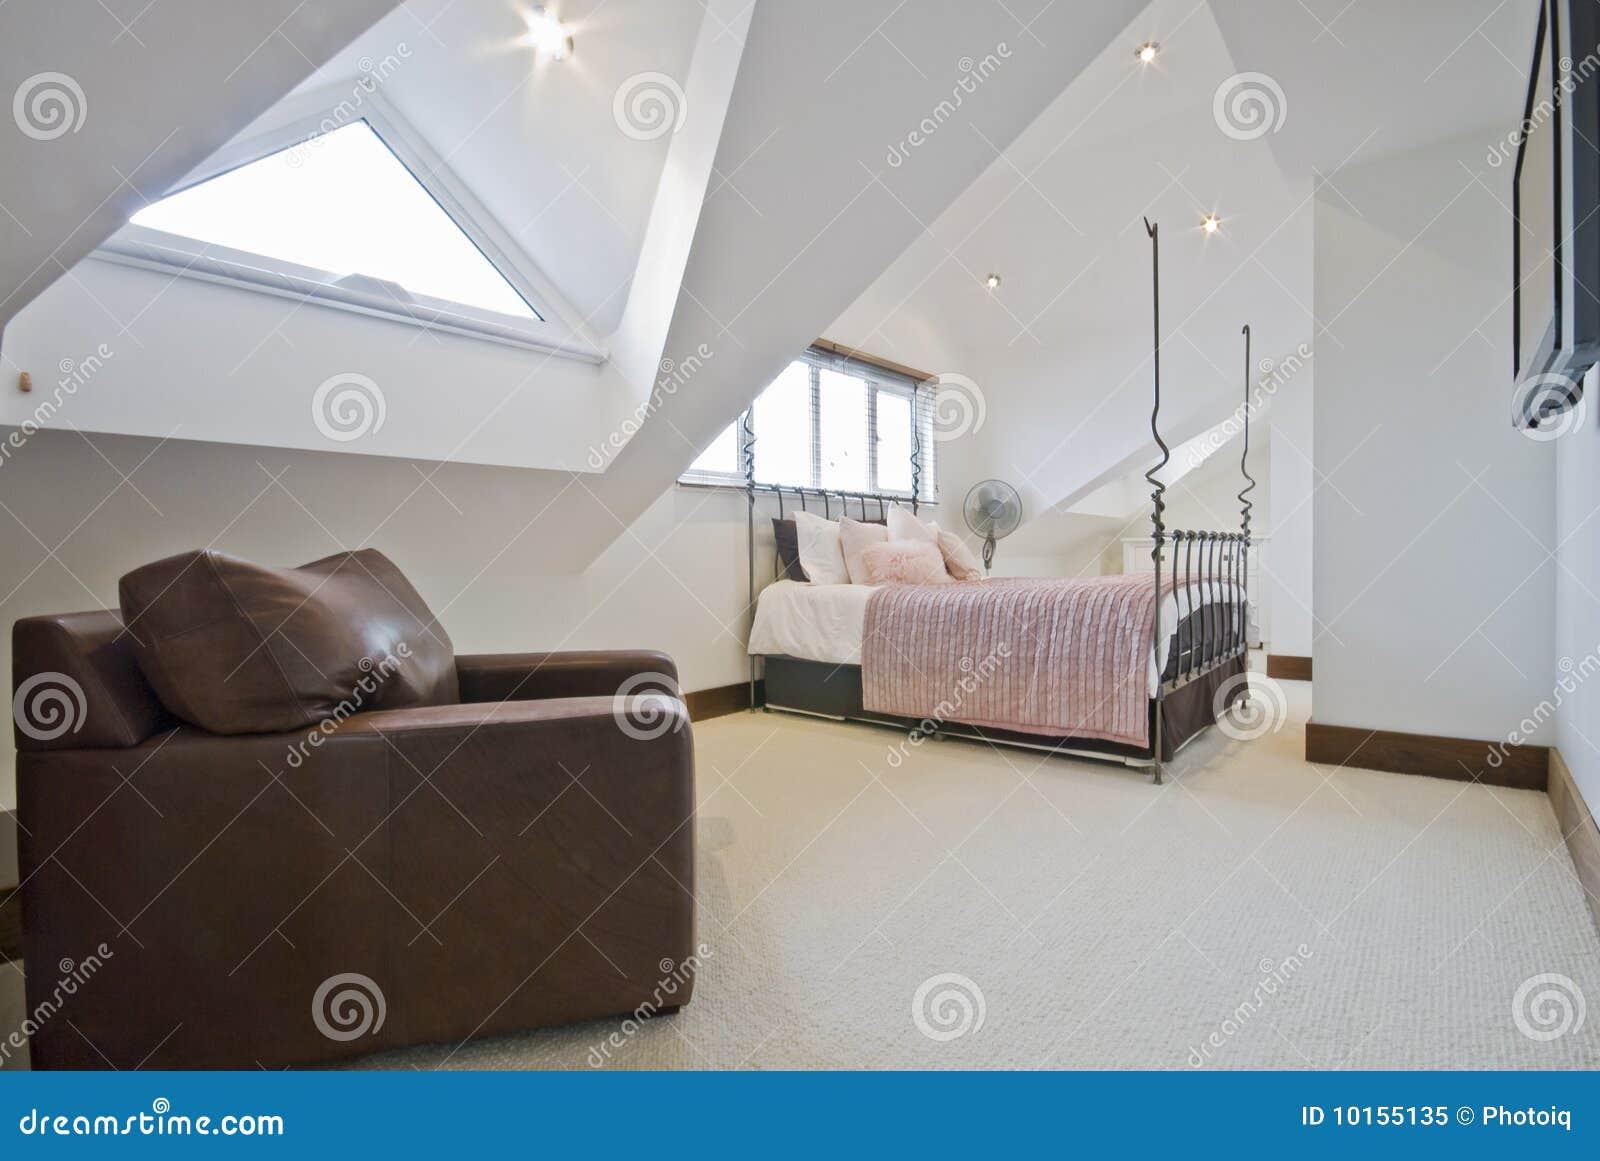 Chambre coucher de grenier photo libre de droits image for Chambre libre